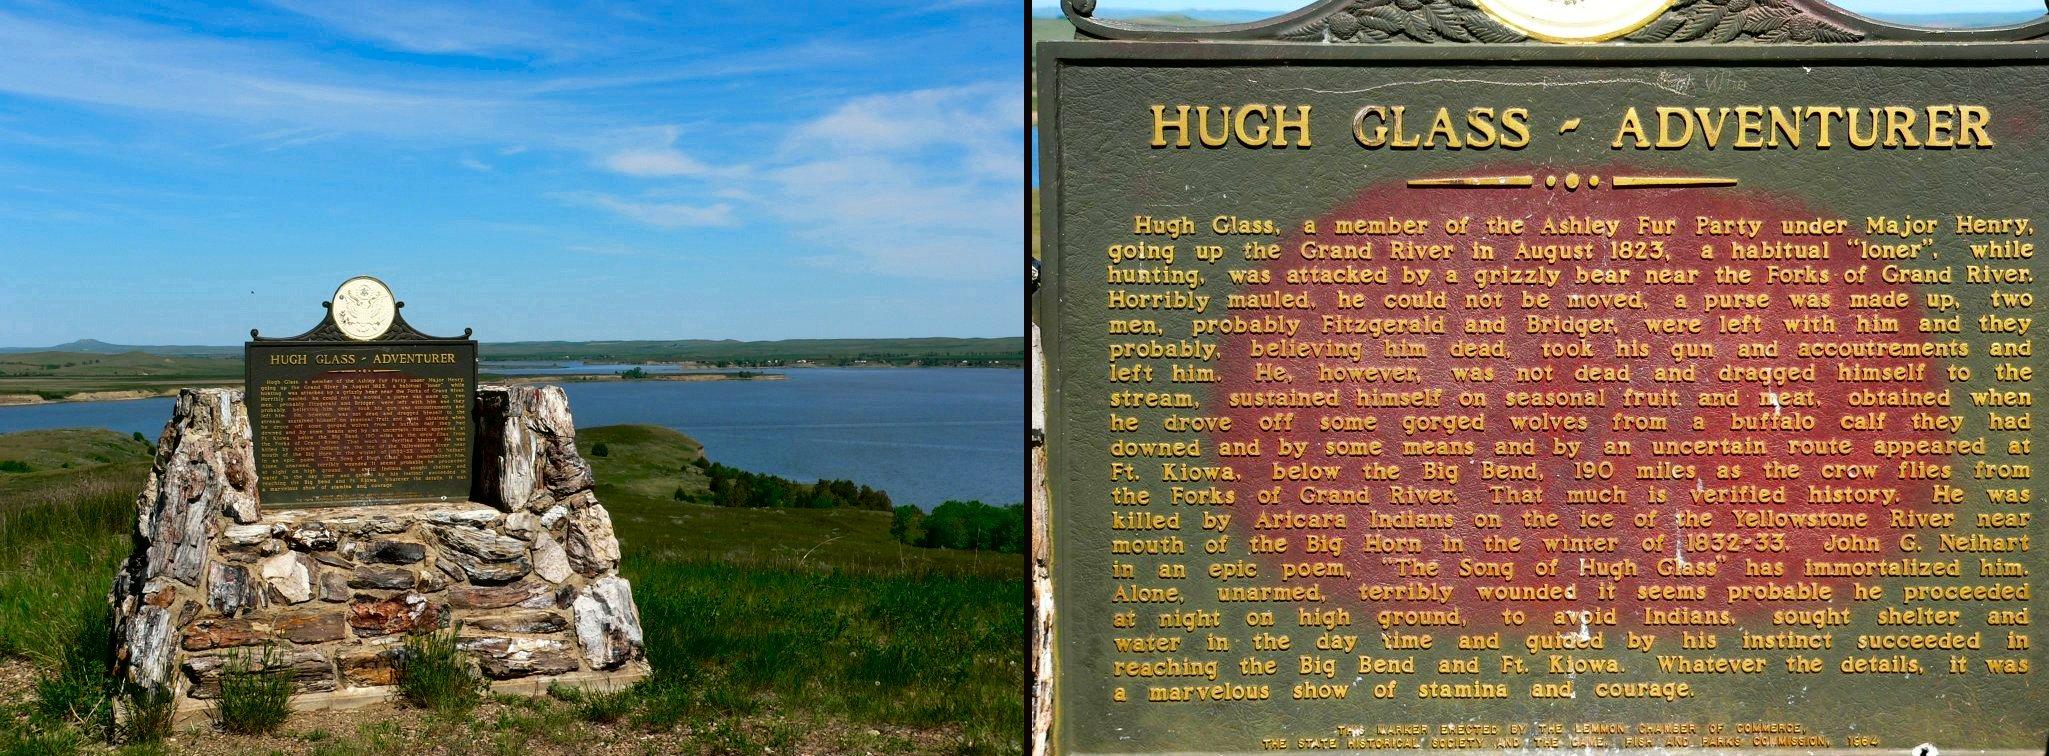 Hugh Glass memorial, near Lemmon, South Dakota